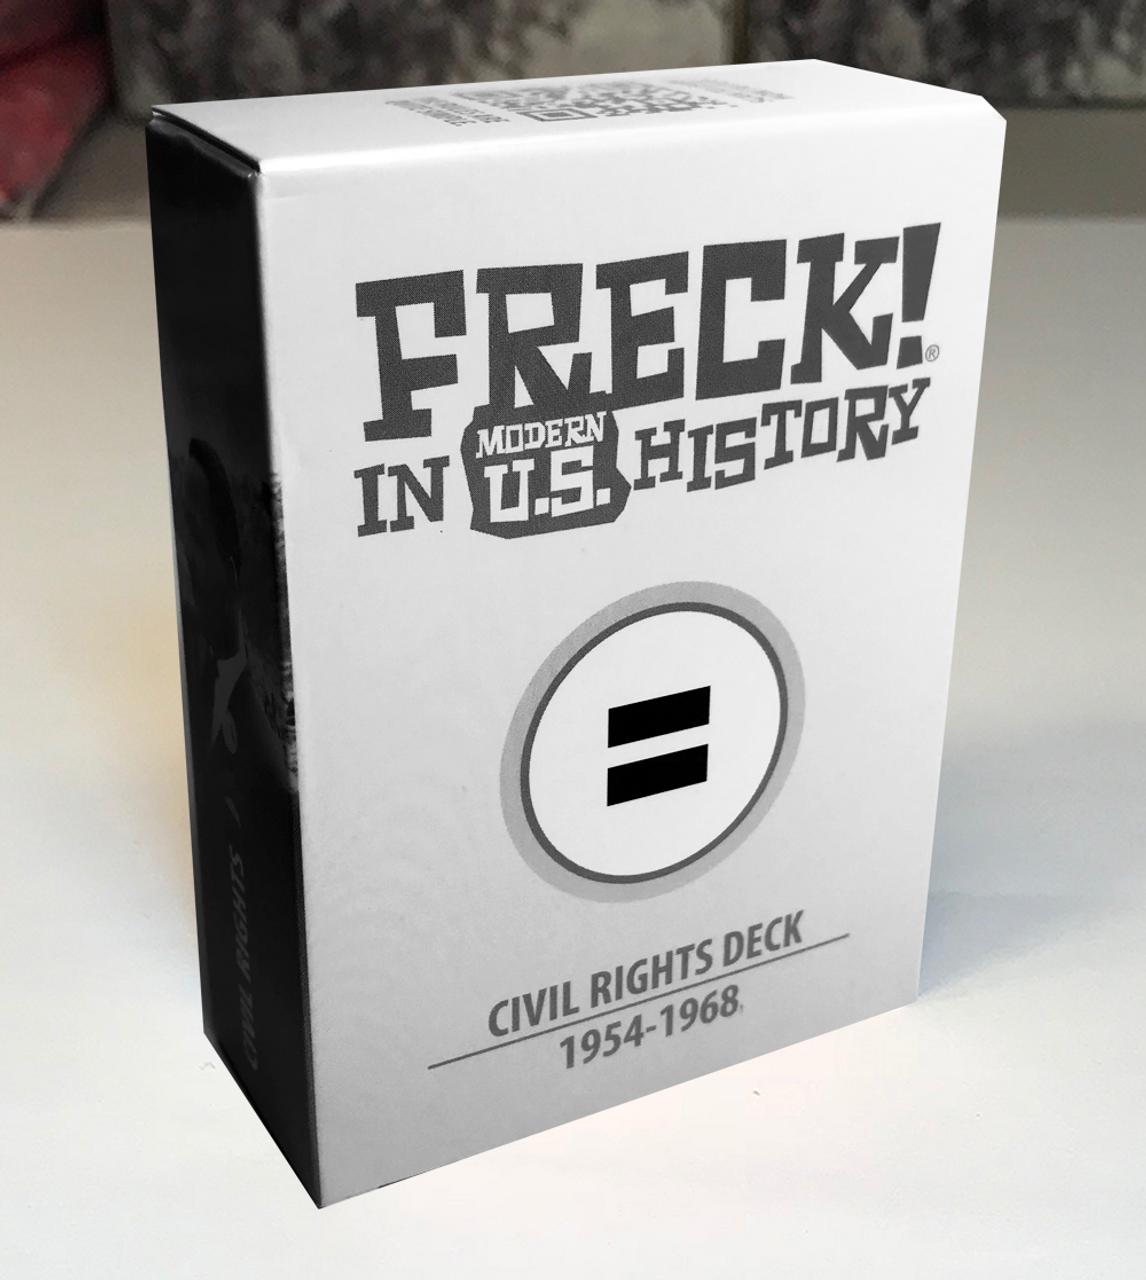 Civil Rights Deck